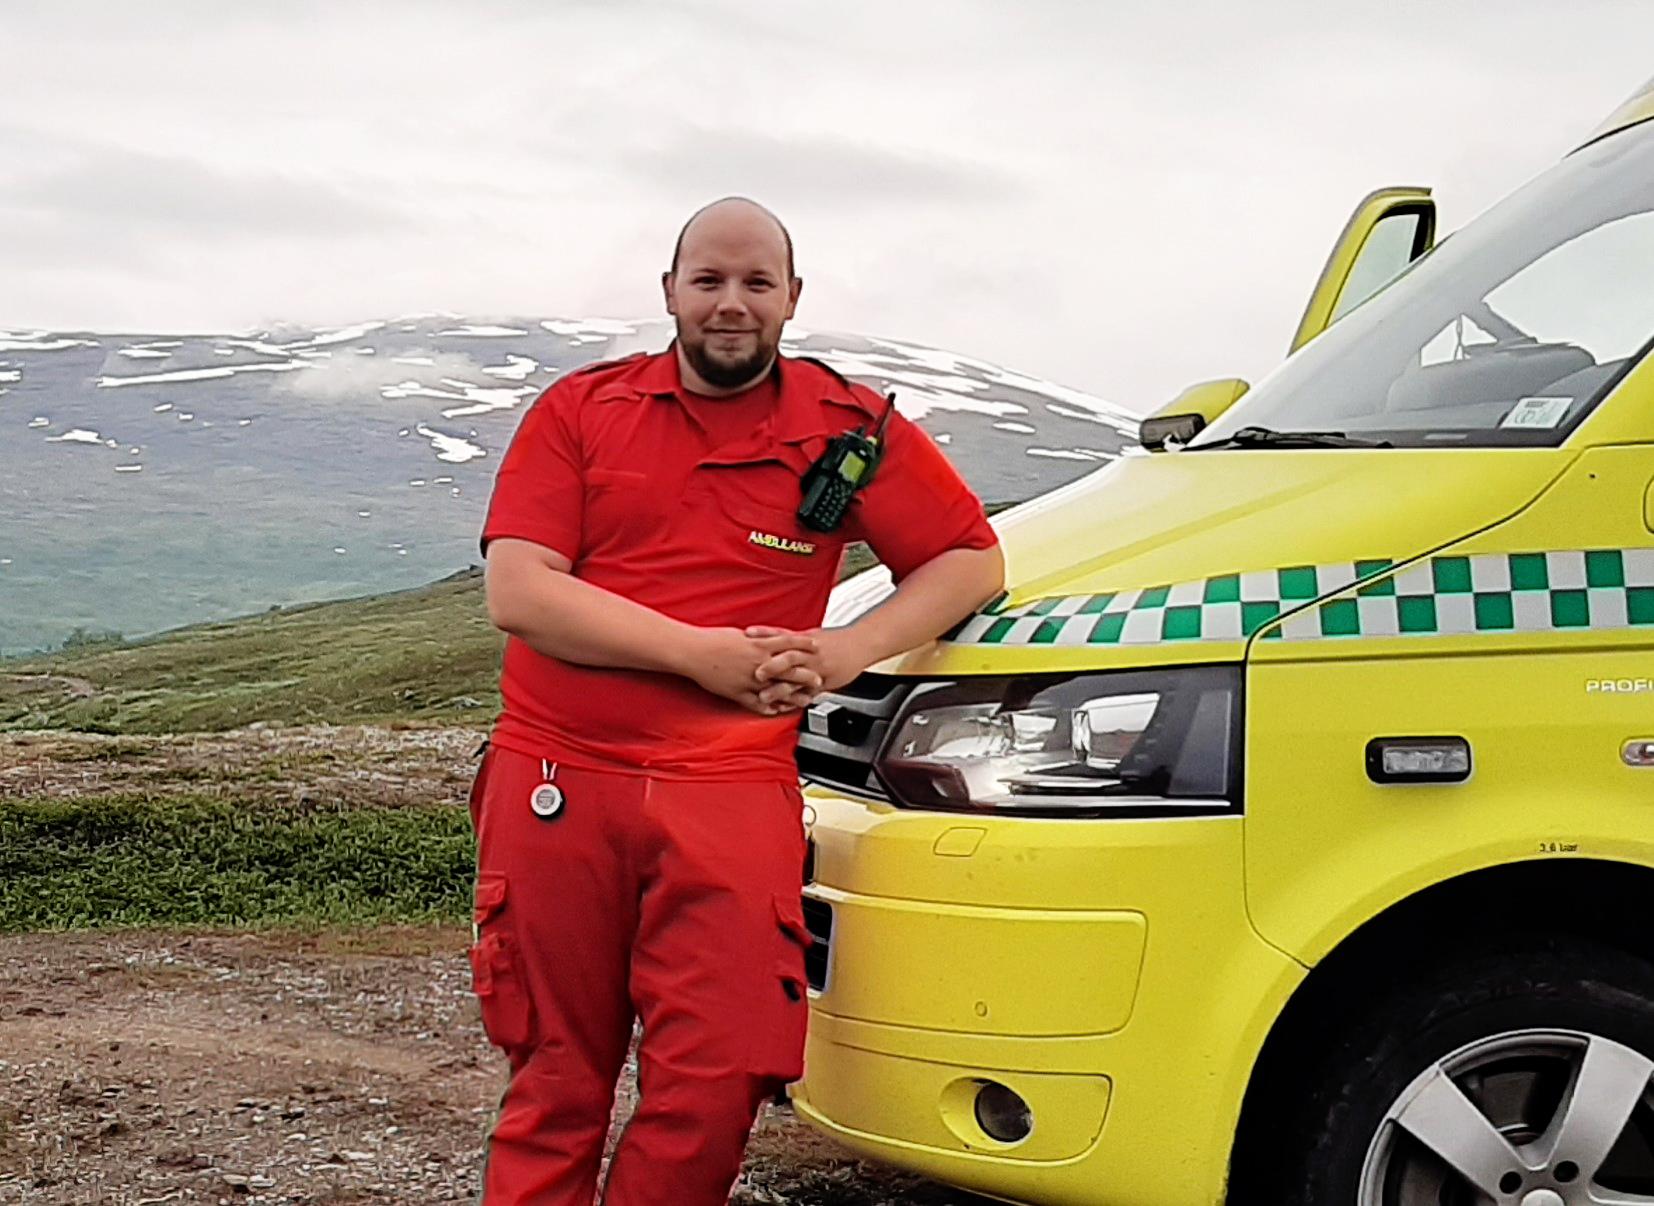 Bilde av David Andersen som er ambulansearbeider, foran ambulansen - Cingulum